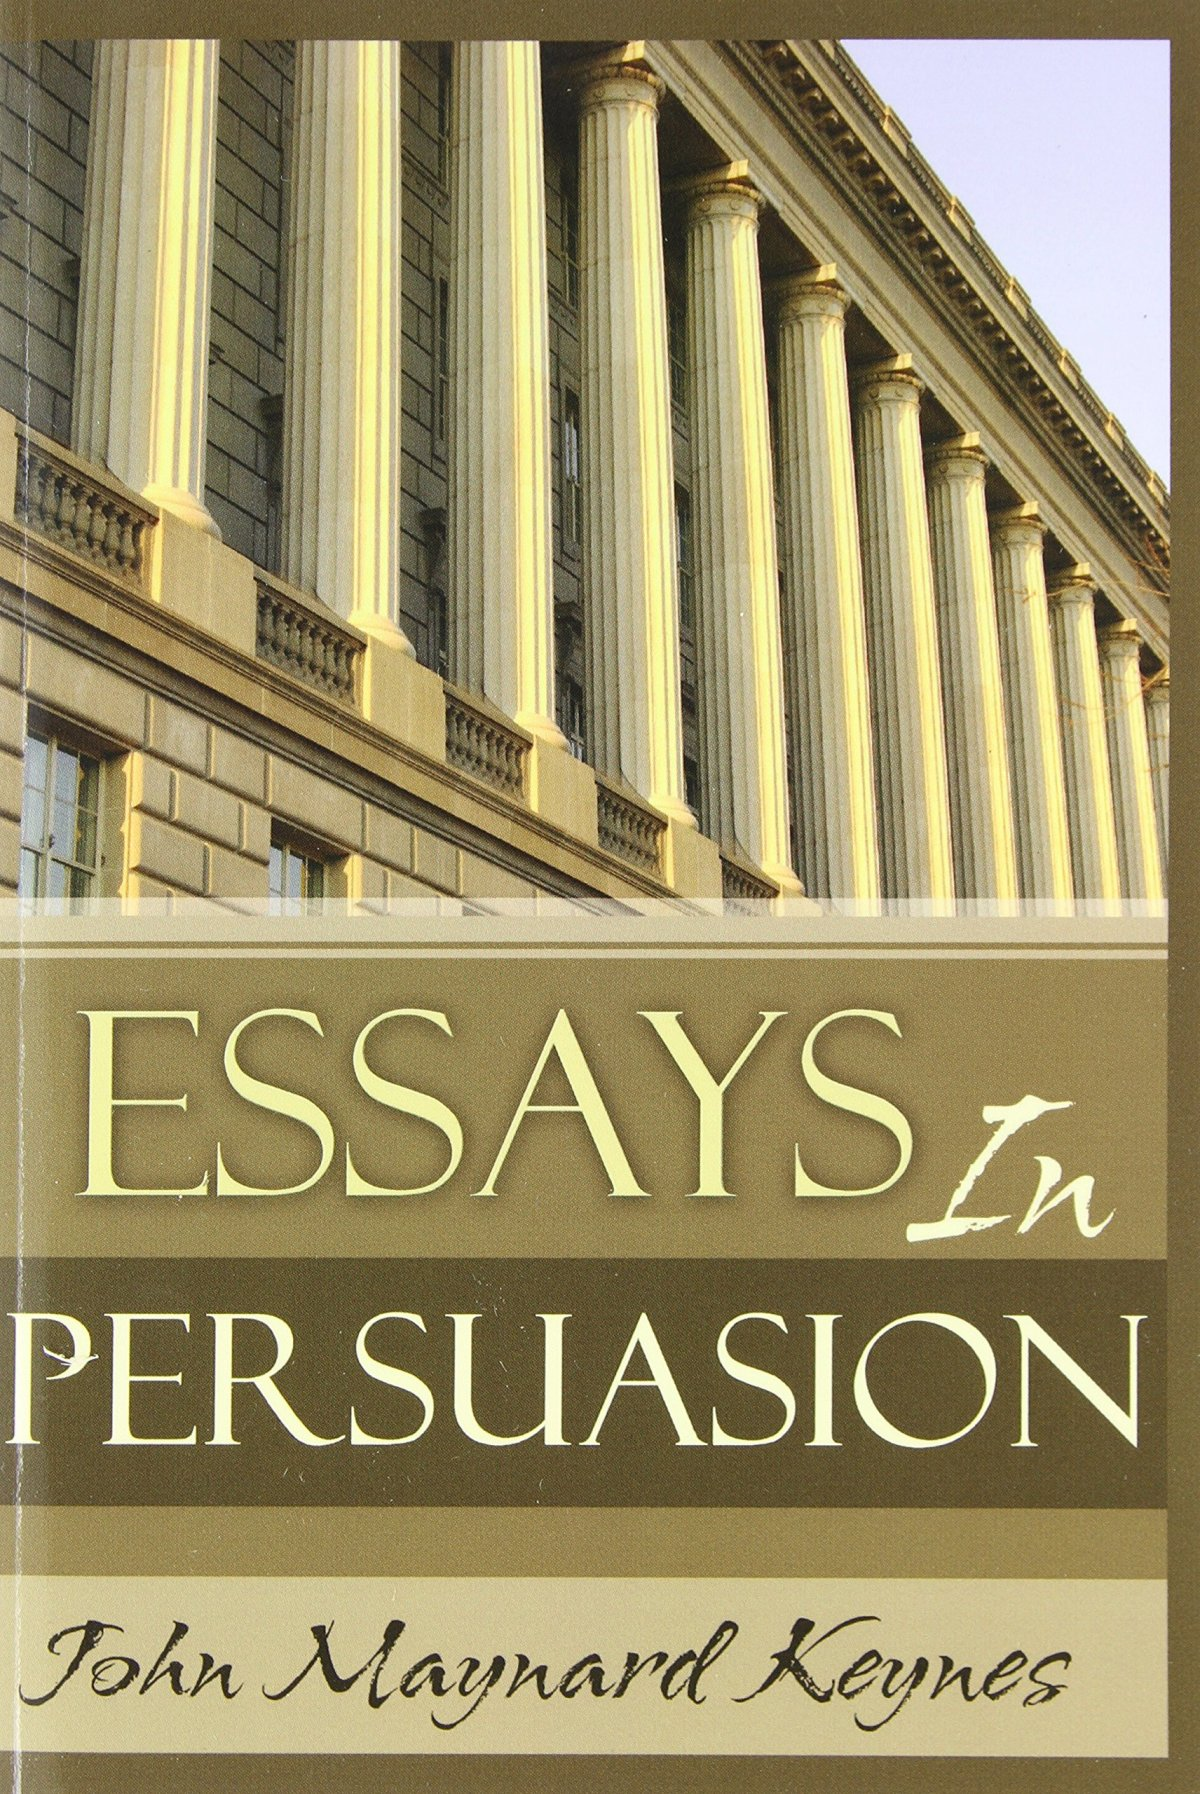 essays-in-persuasion-by-john-maynard-keynes